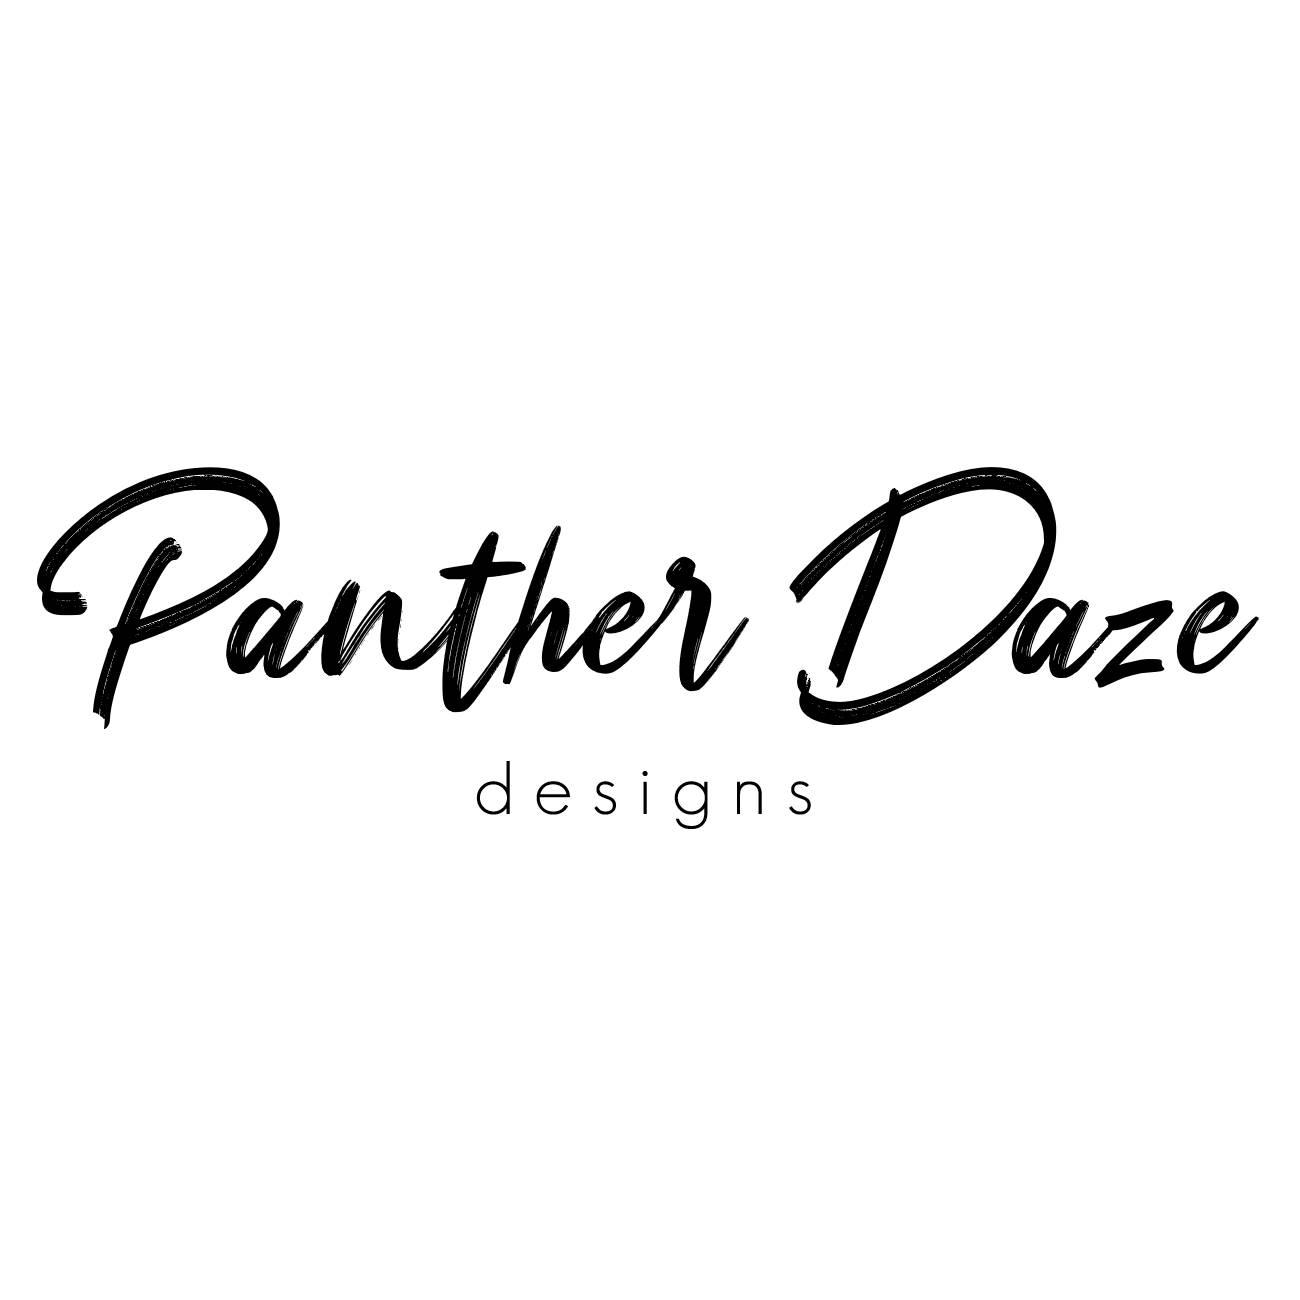 Panther Daze Designs